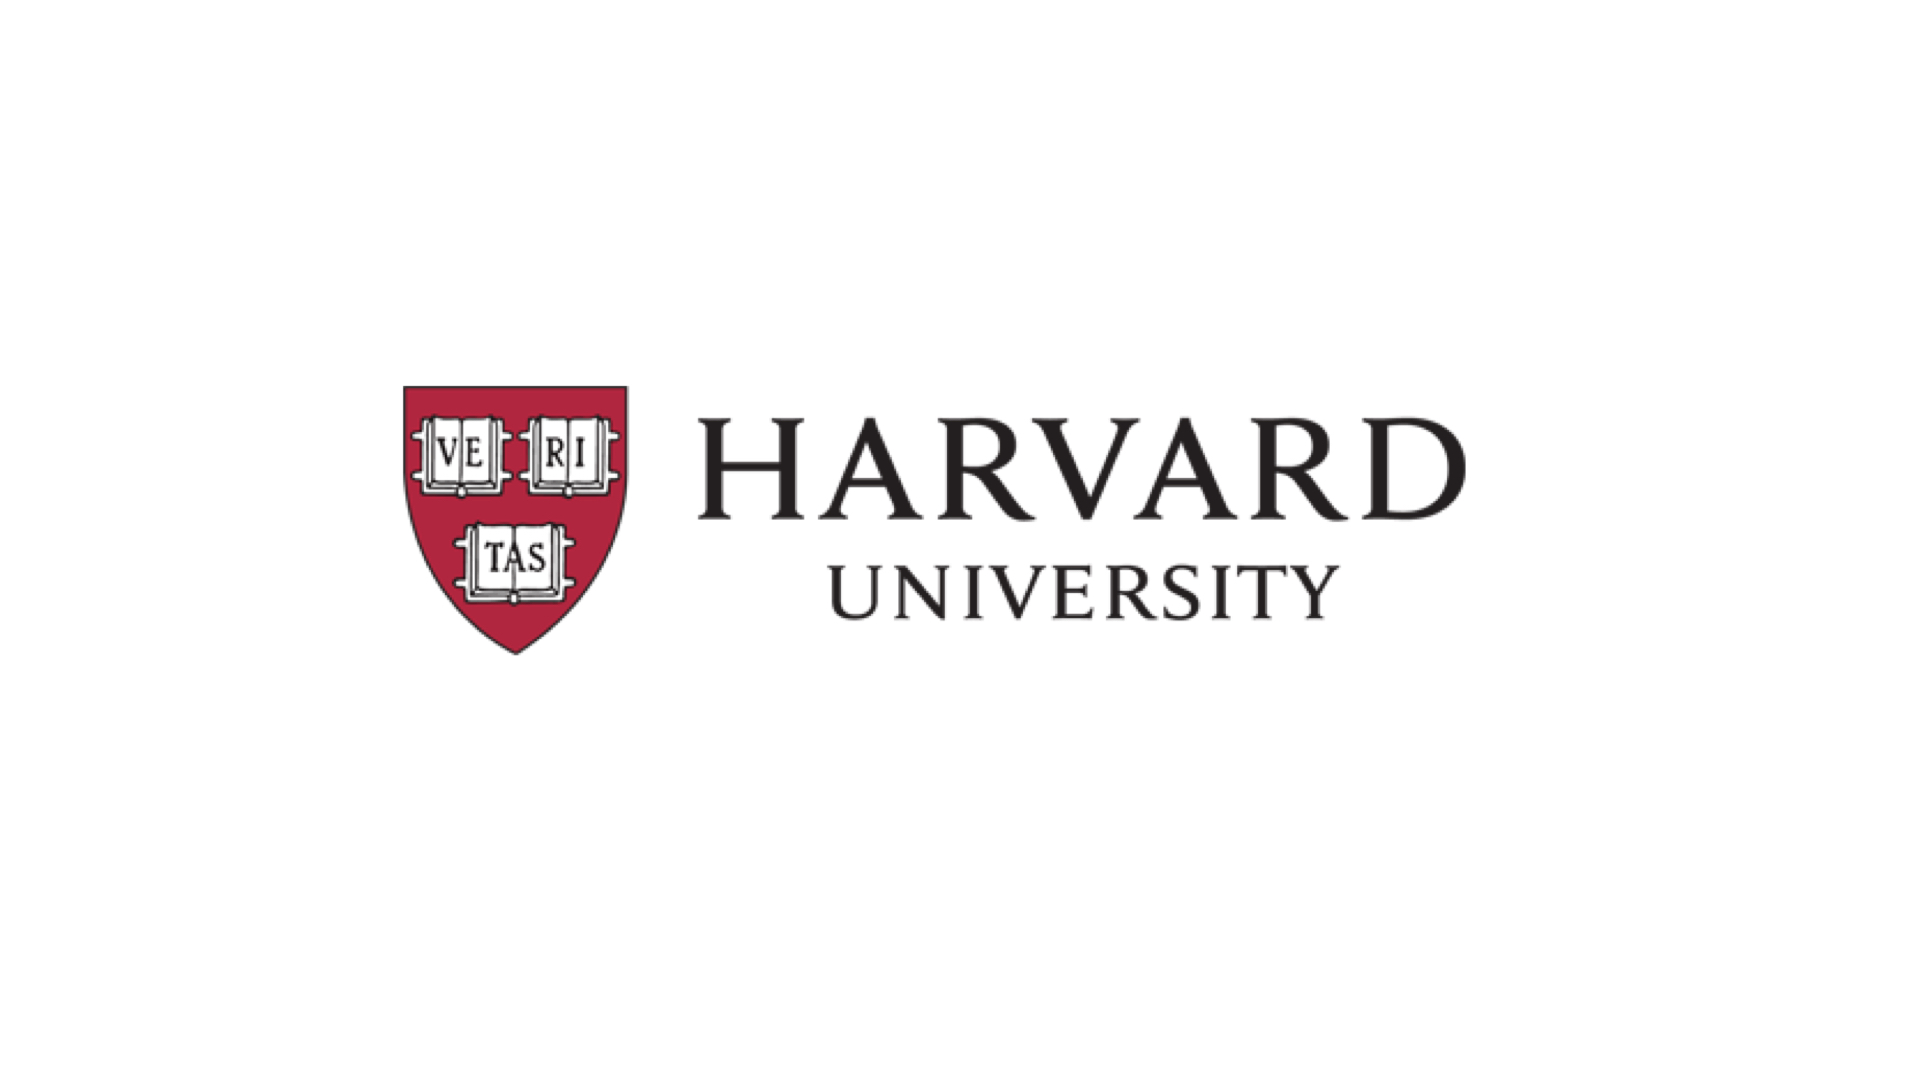 Harvard Presentation - Created presentation deck for Harvard presentation.